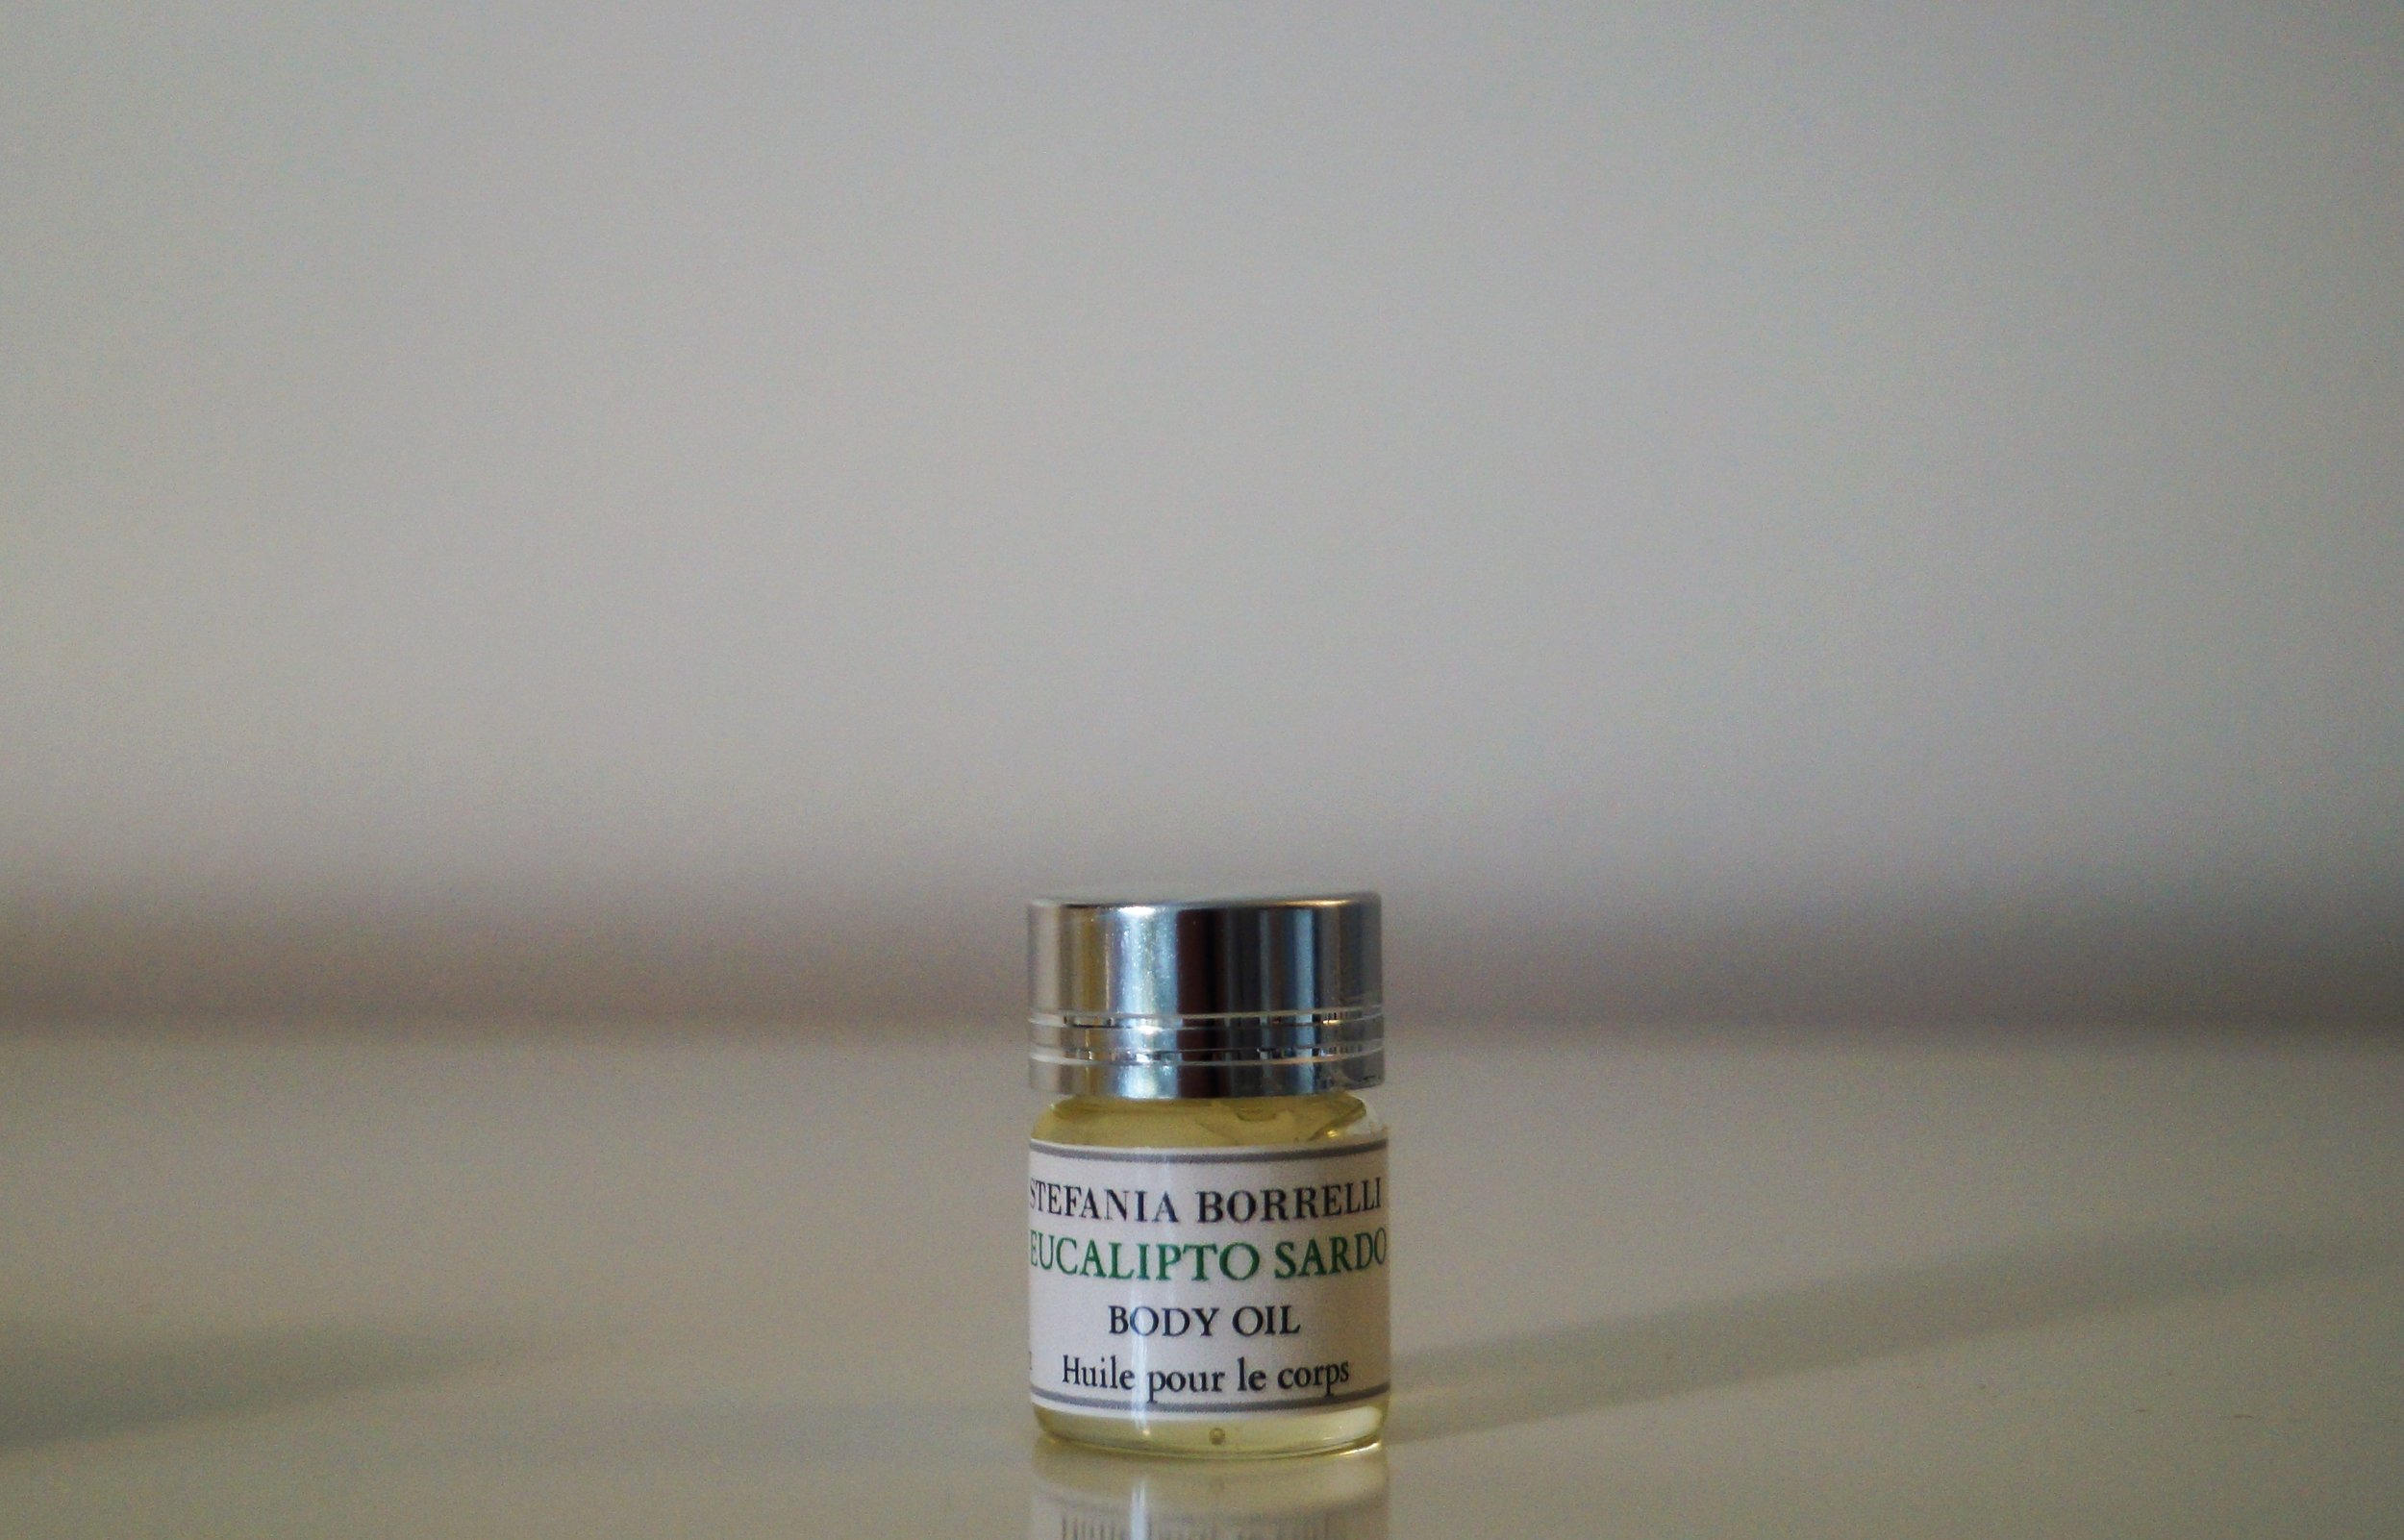 EUCALIPTO SARDO - Sardinina Eucalyptus  Aroma: Uplifting, refreshing, energizing, fresh, camphoraceous, sweet and slightly balsamic.